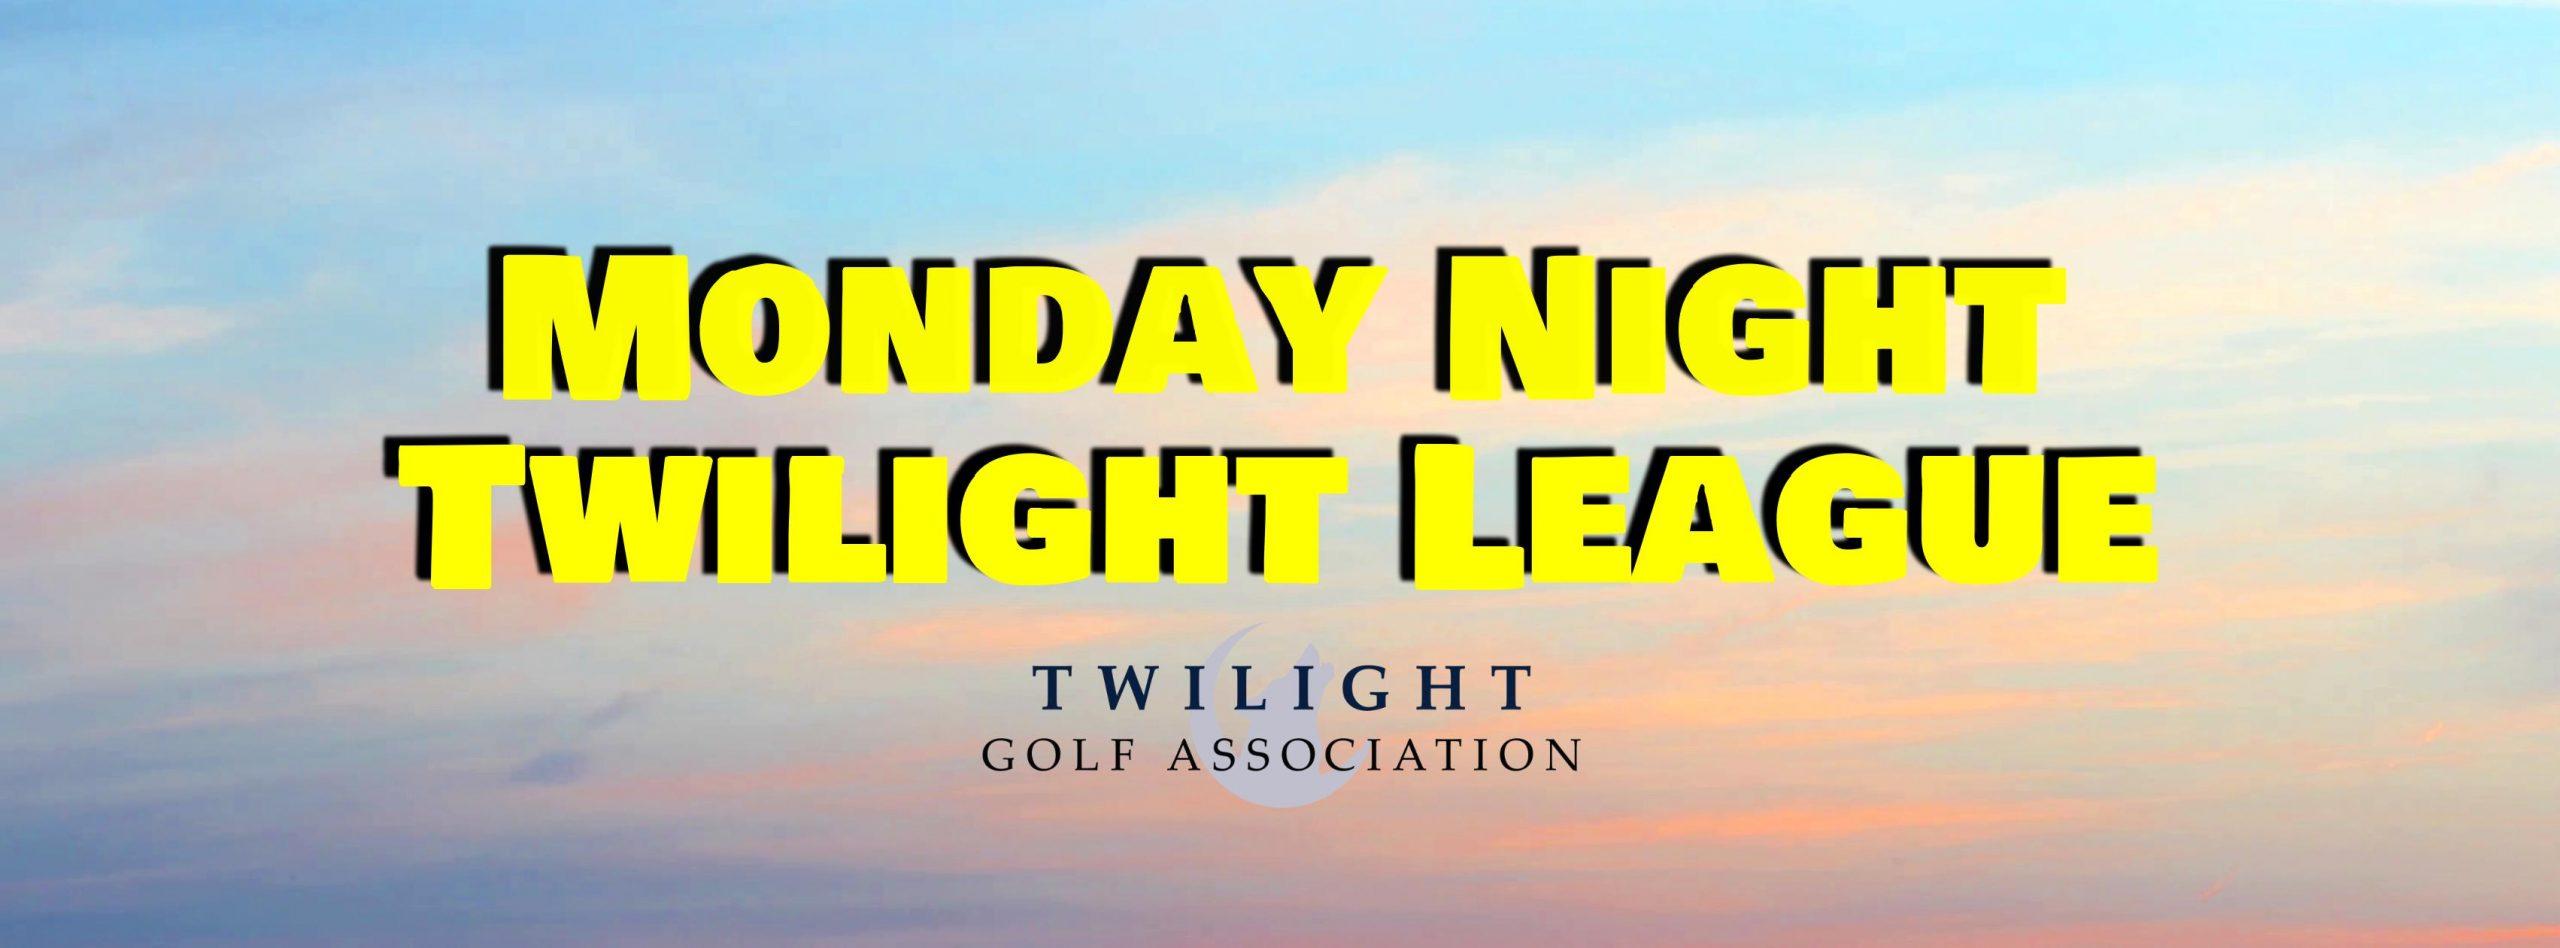 Monday Night Twilight League at Elks Run Golf Club